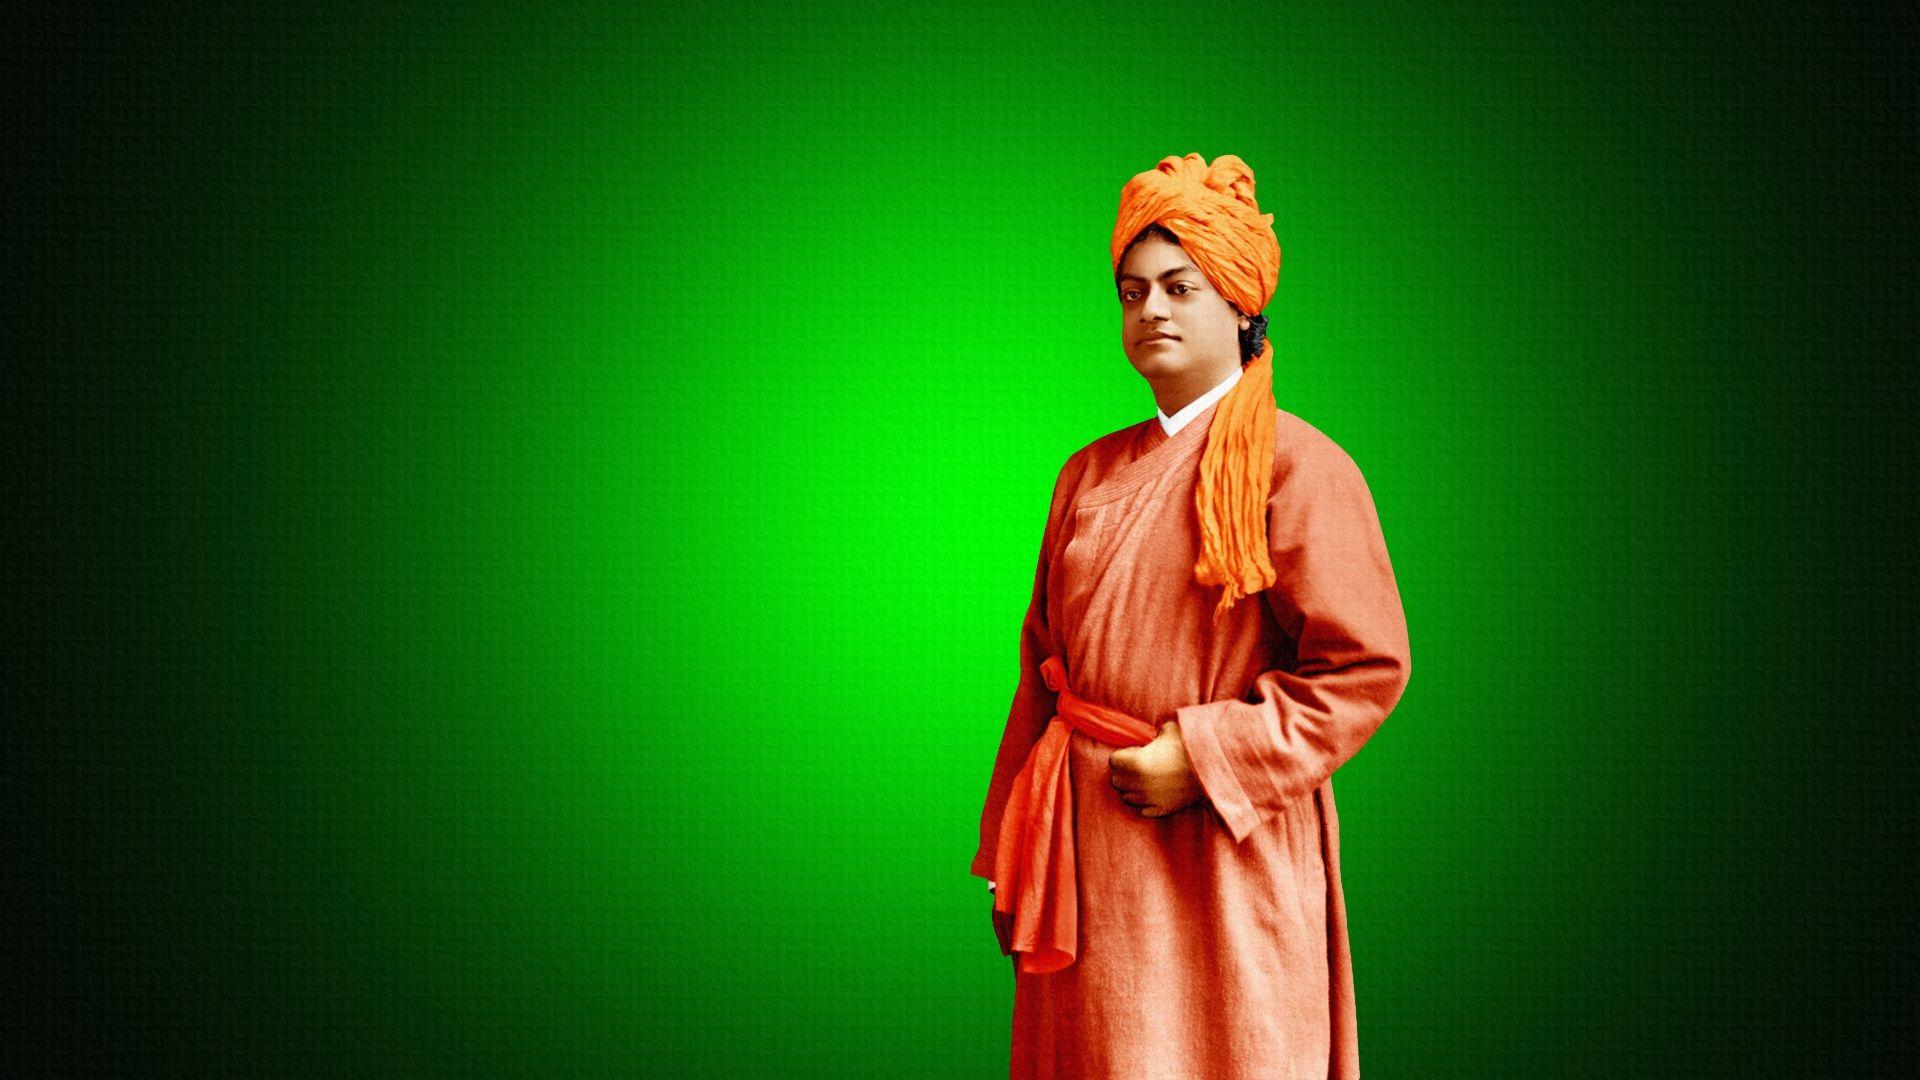 Vivekananda Reddy Hd: Swami Vivekananda HD Wallpaper